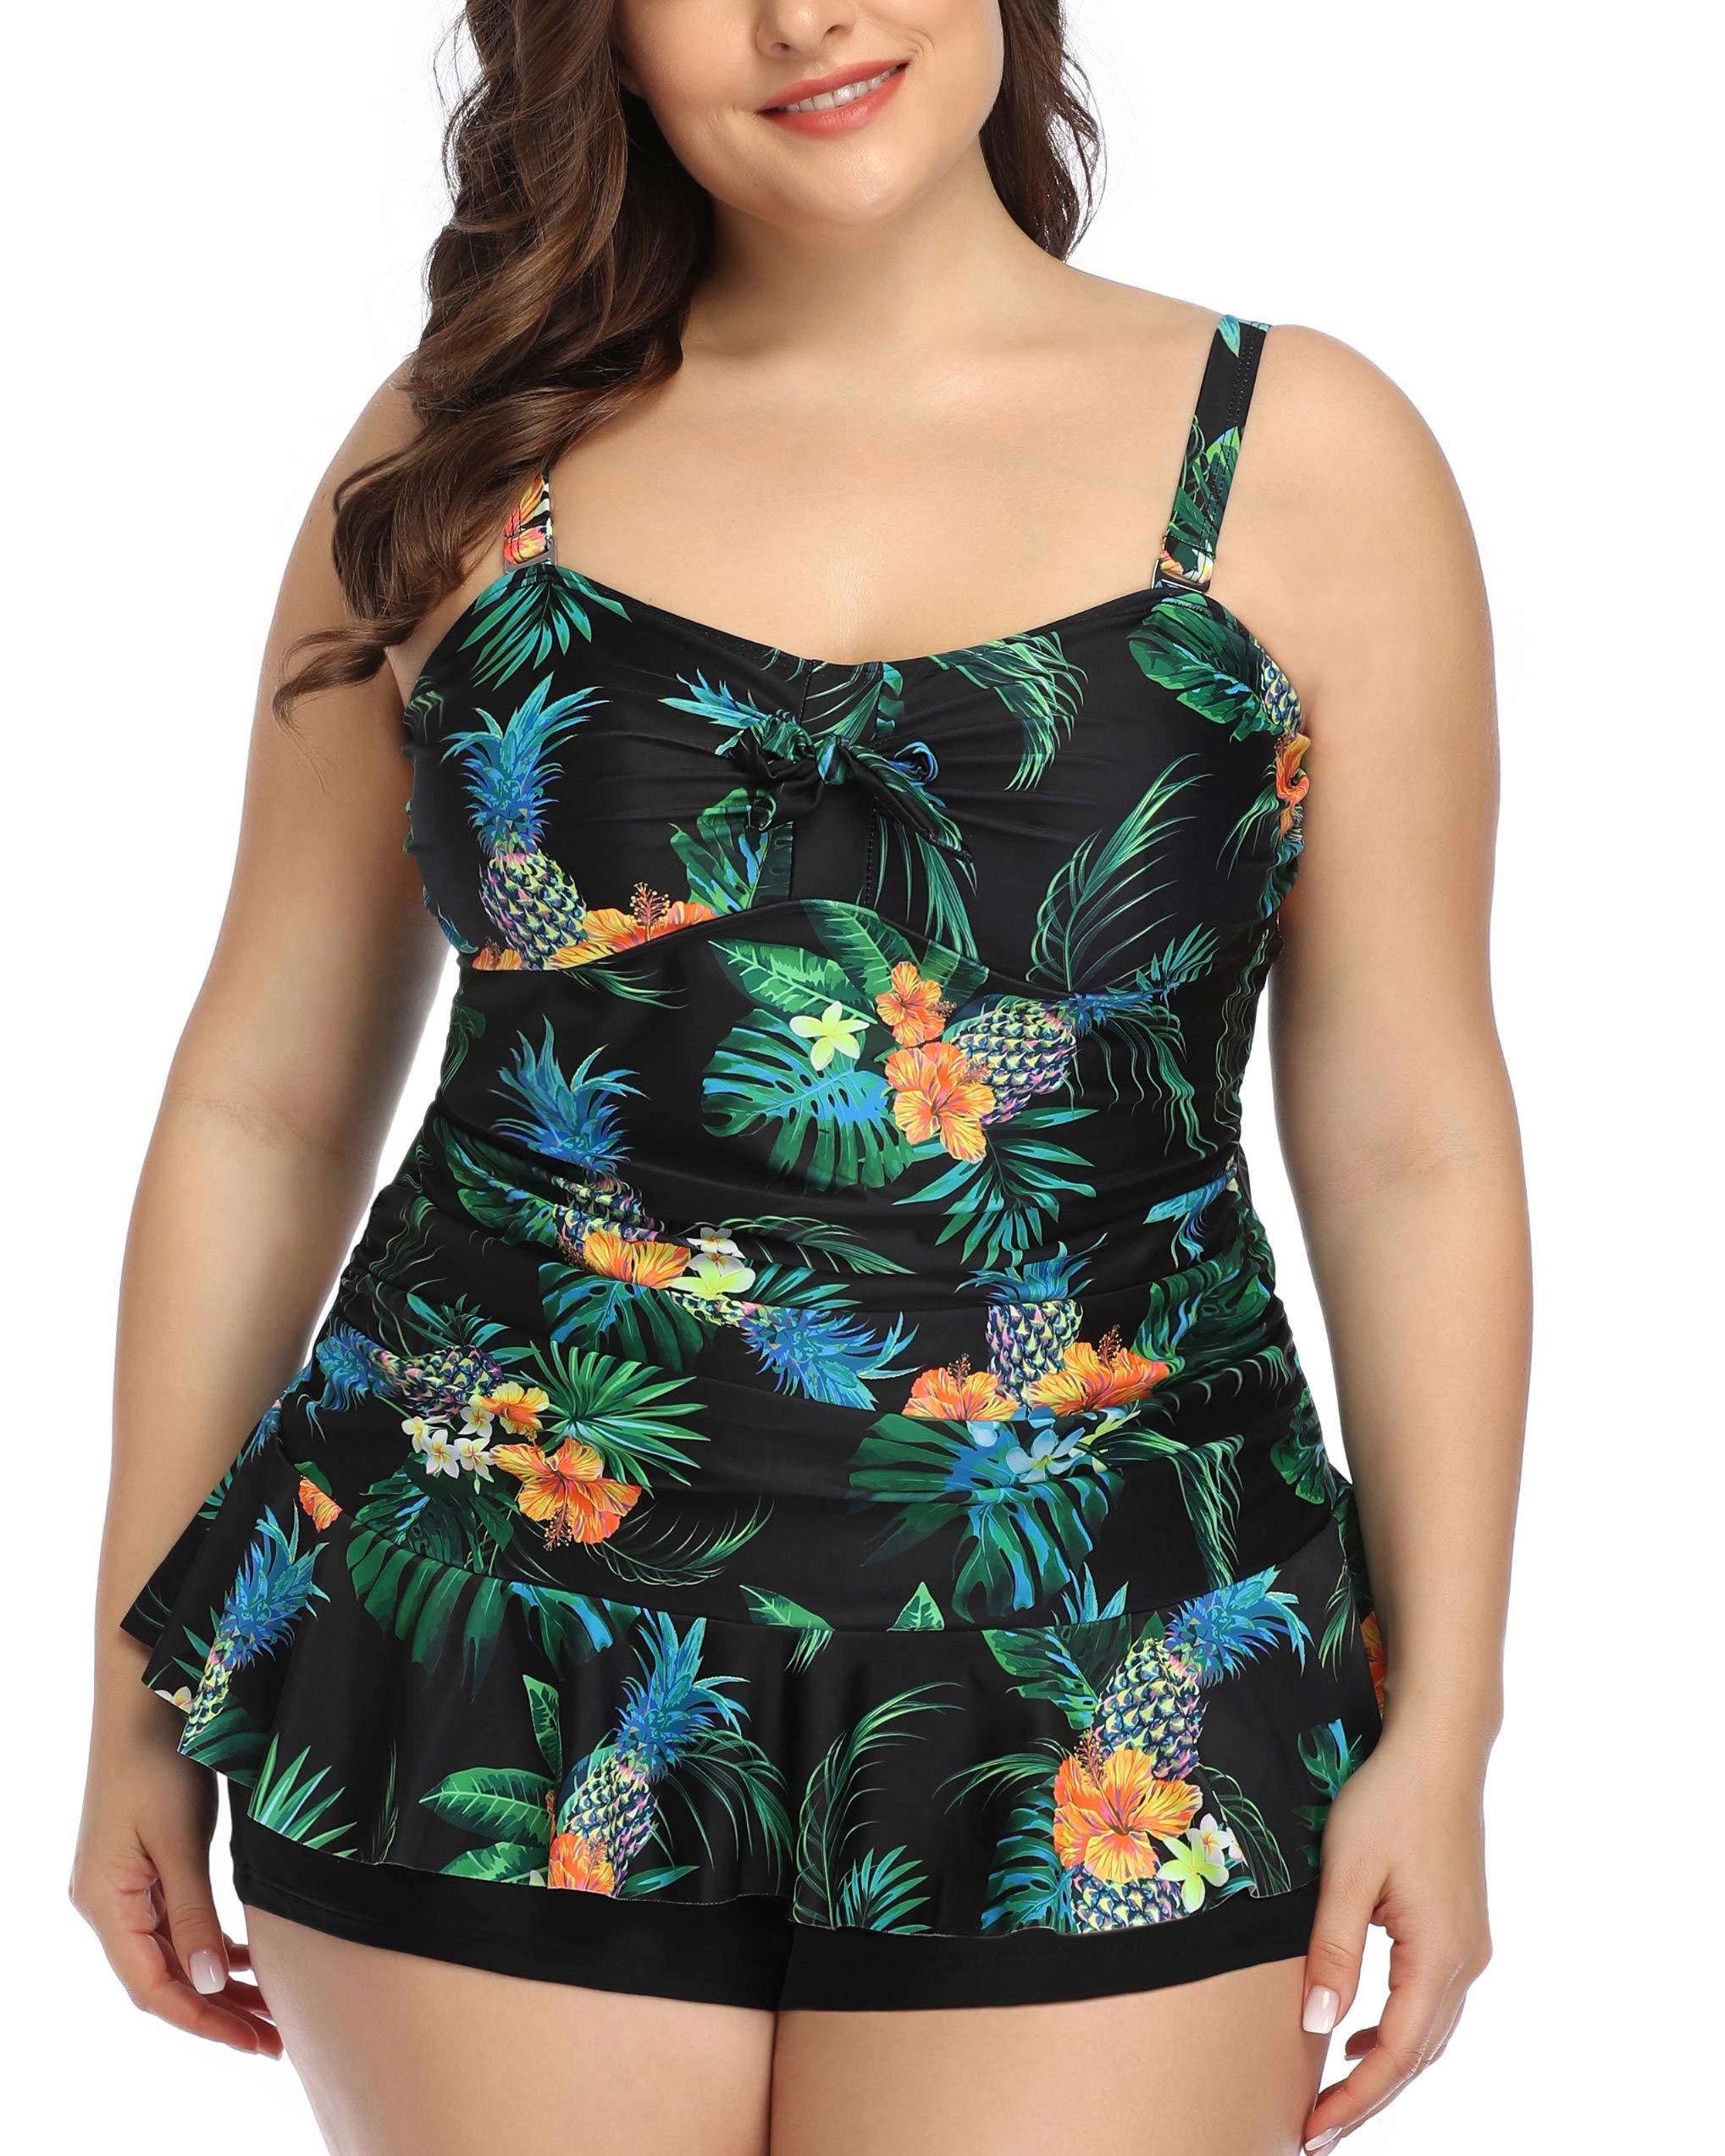 Daci Women Plus Size Ruched Tankini Retro Padded Swimsuit Ruffle Hem Top with Black Boyshort